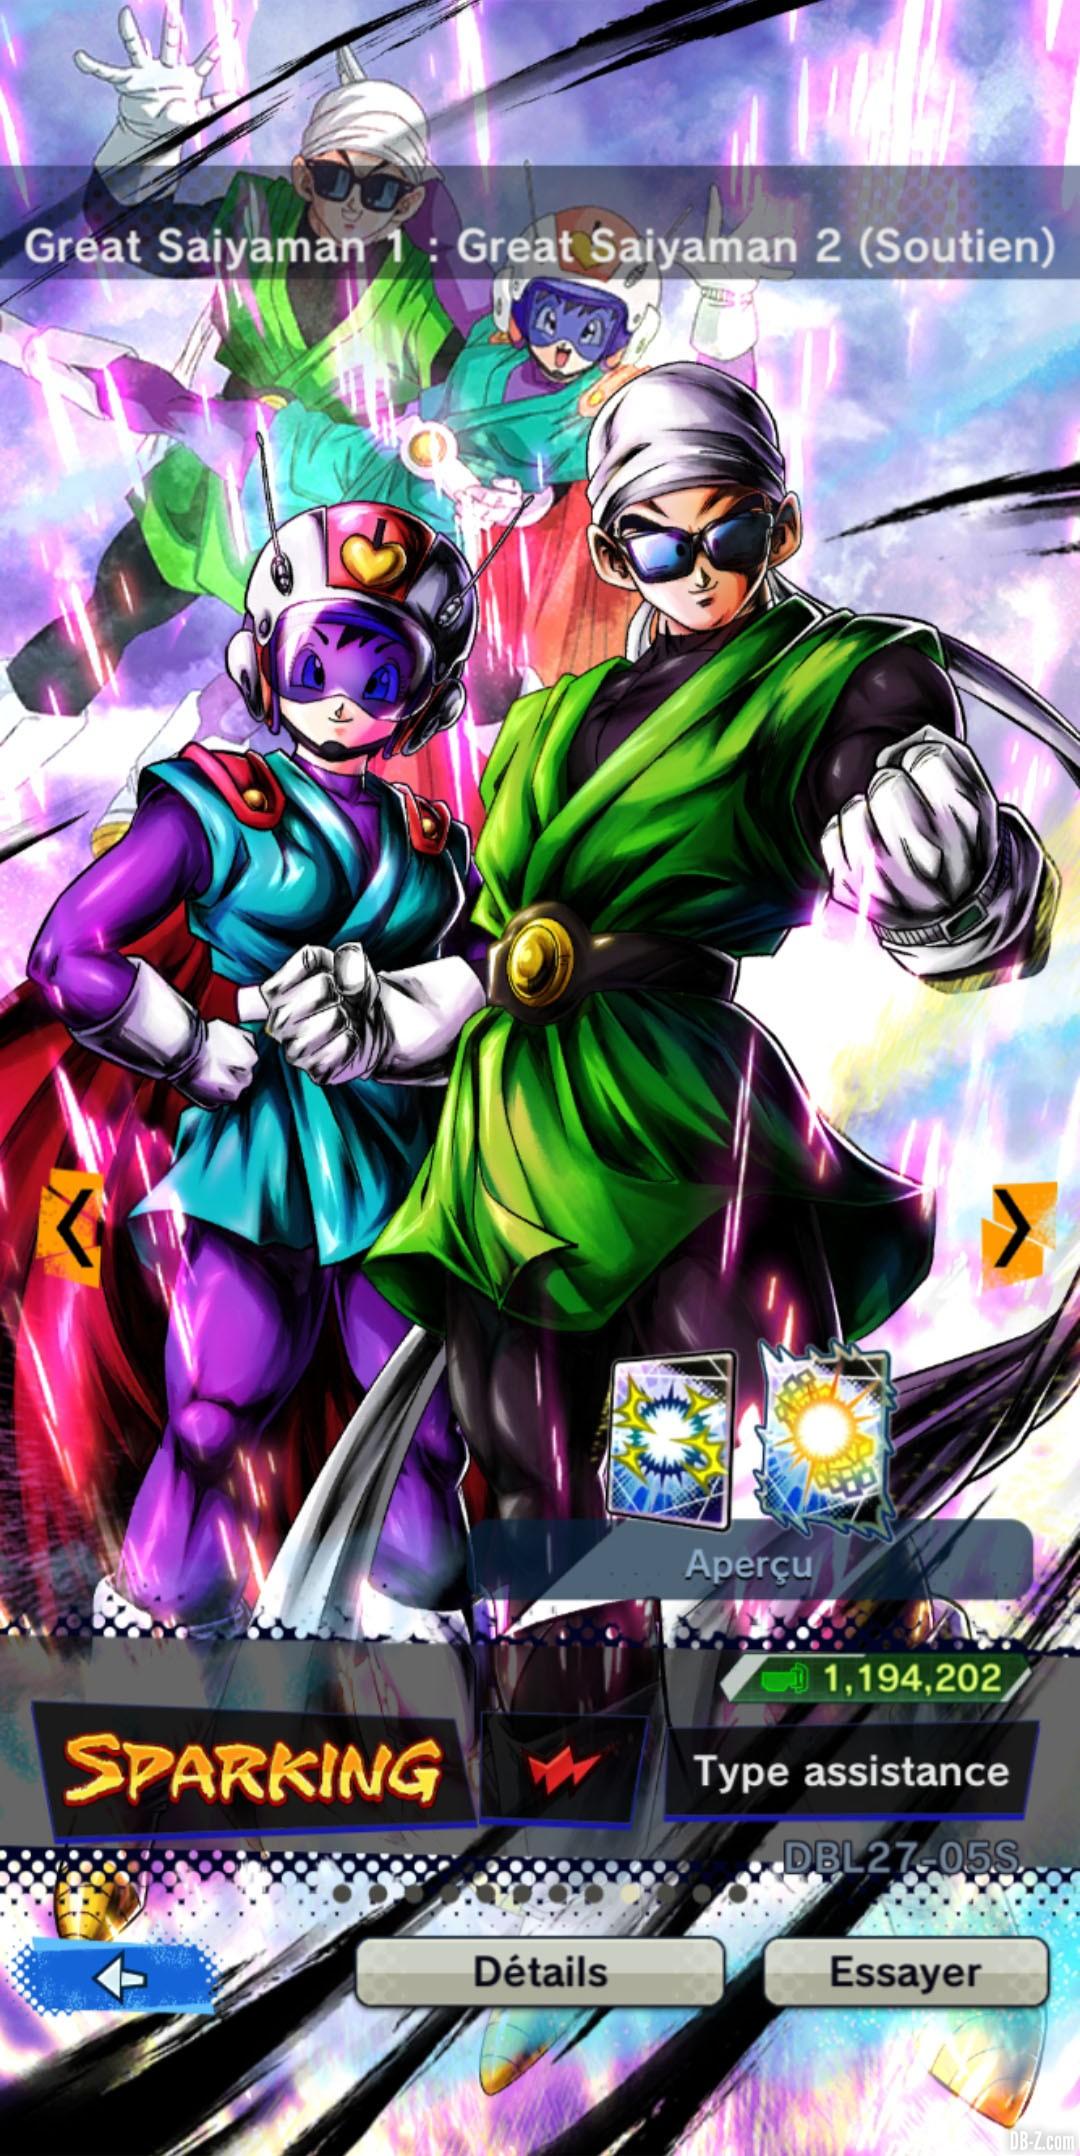 Dragon Ball Legends Great Saiyaman 1 et 2 ROUGE